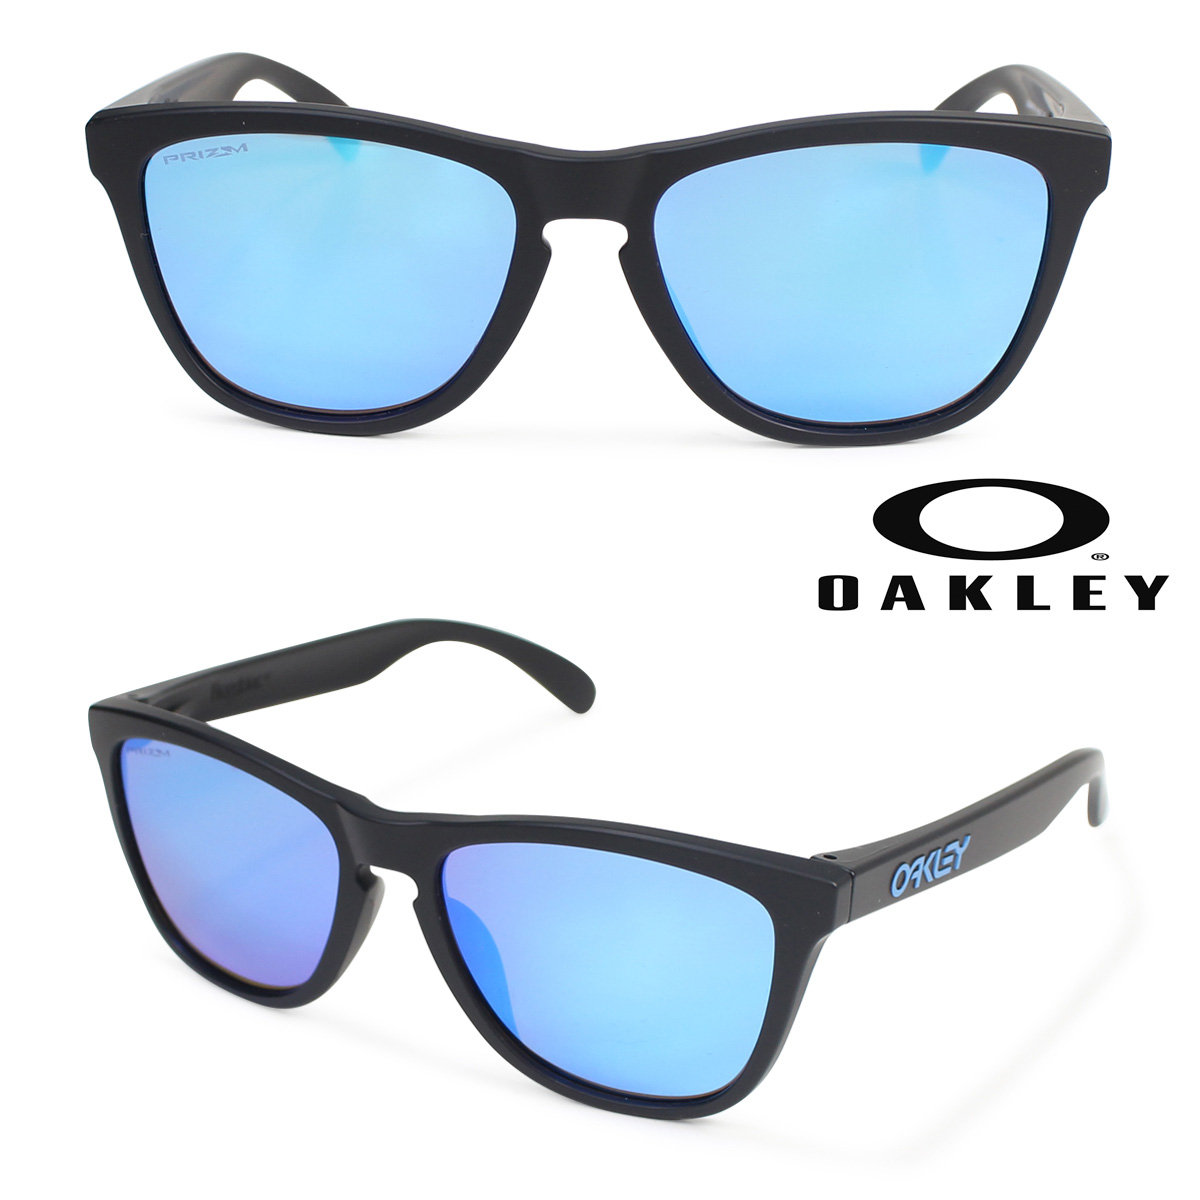 Oakley サングラス アジアンフィット オークリー Frogskins フロッグスキン ASIA FIT OO9245-6154 メンズ レディース